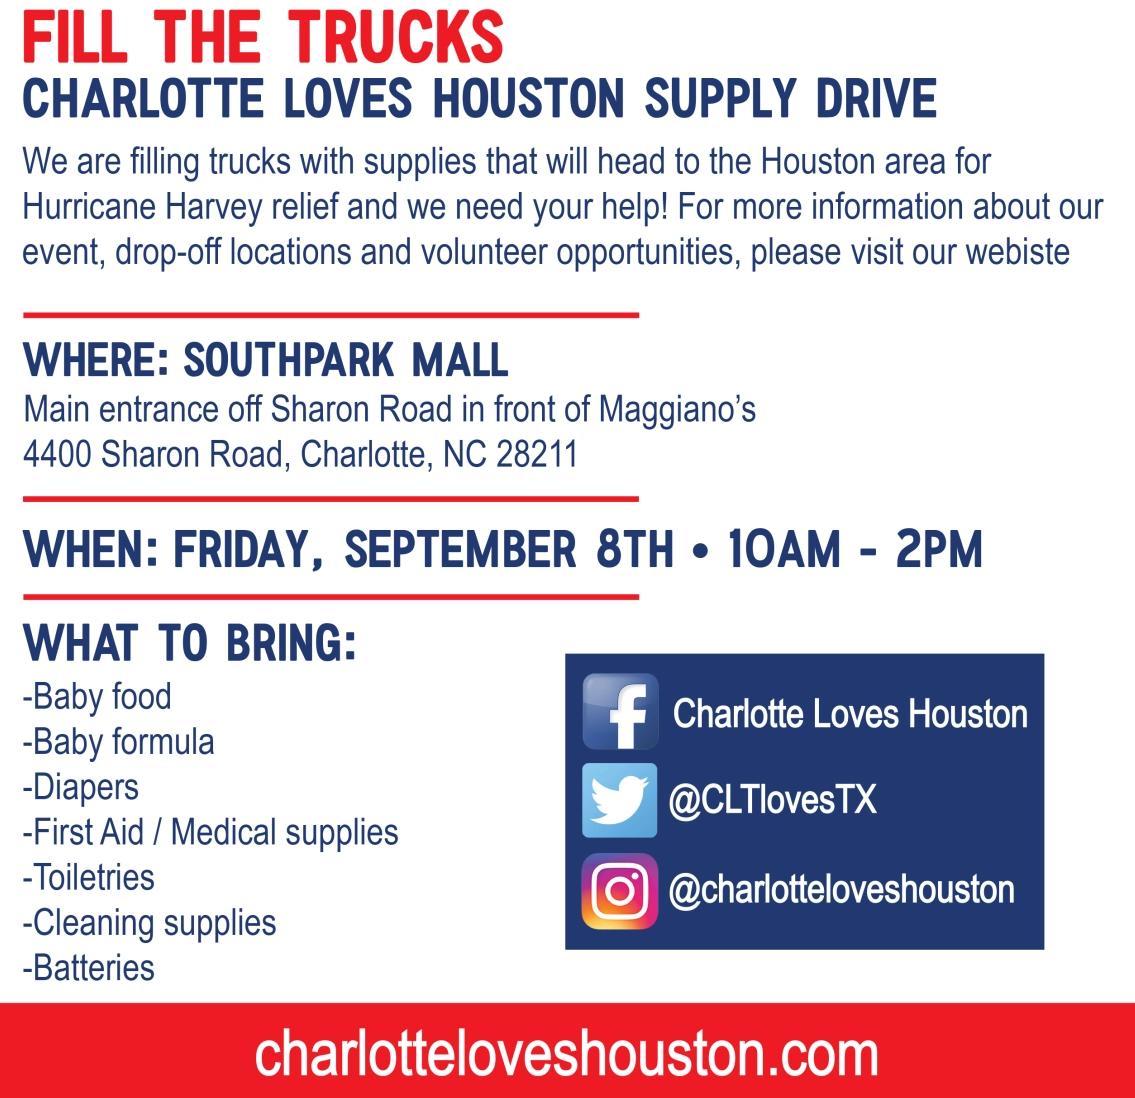 Charlotte Loves Houston Fill The Trucks Supply Drive